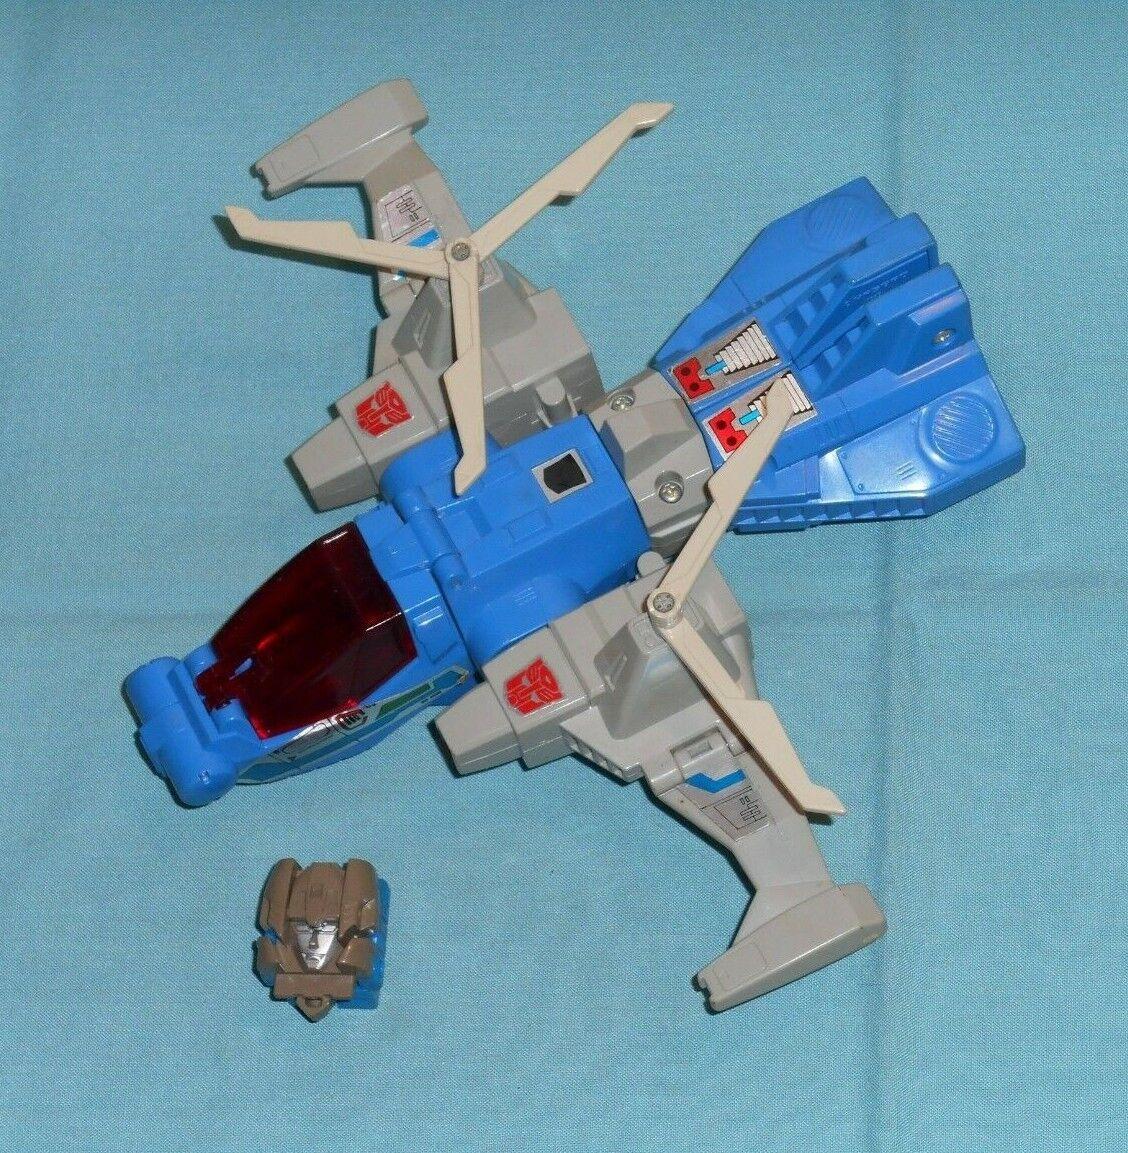 Original G1 Transformers headmaster HIGHBROW corpo WITH HEADMASTER GORT only